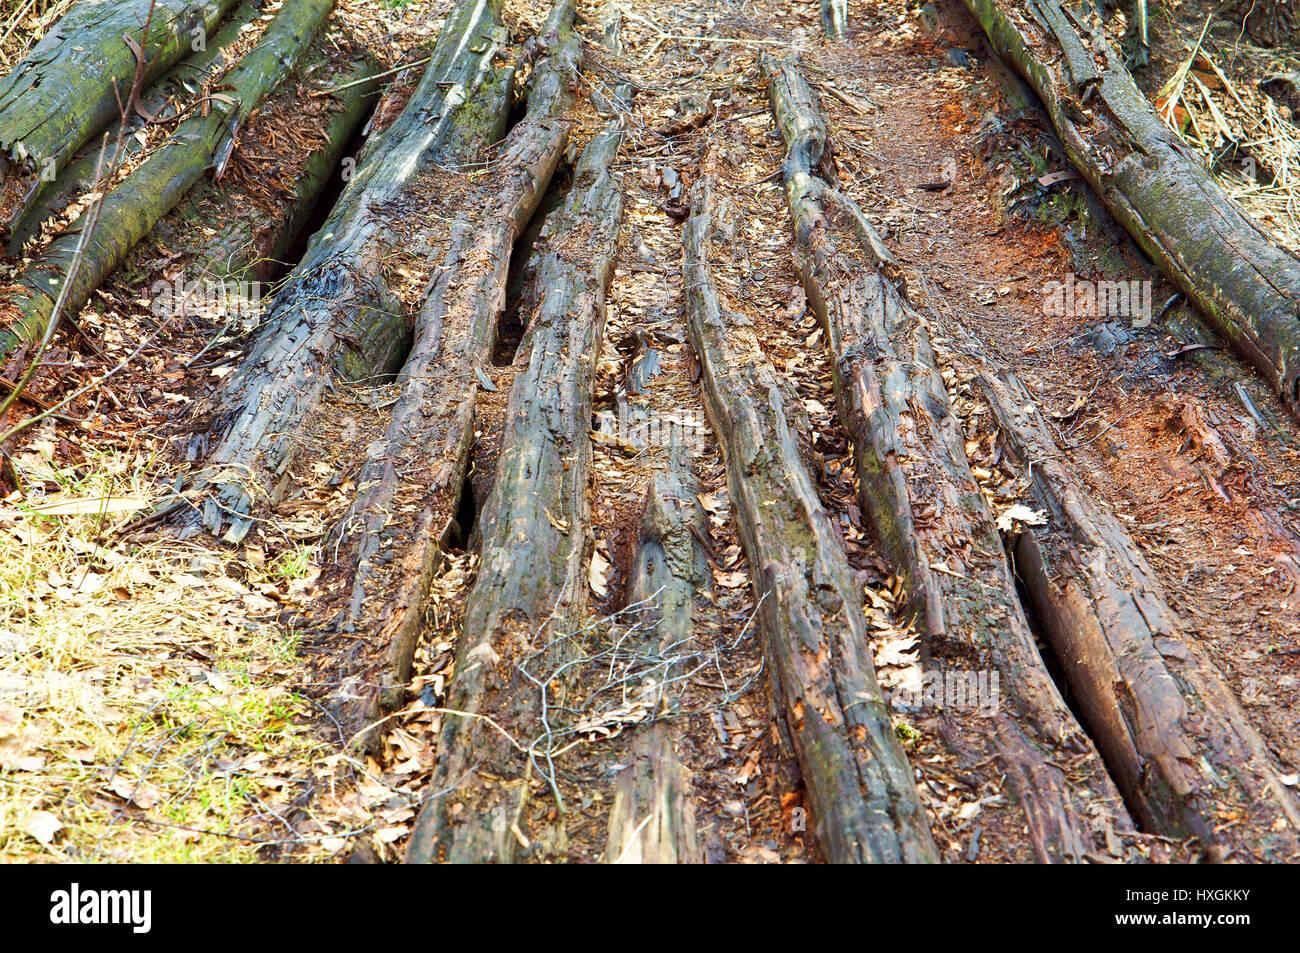 old rotten wooden bridge, decrepit old rotten boards - Stock Image